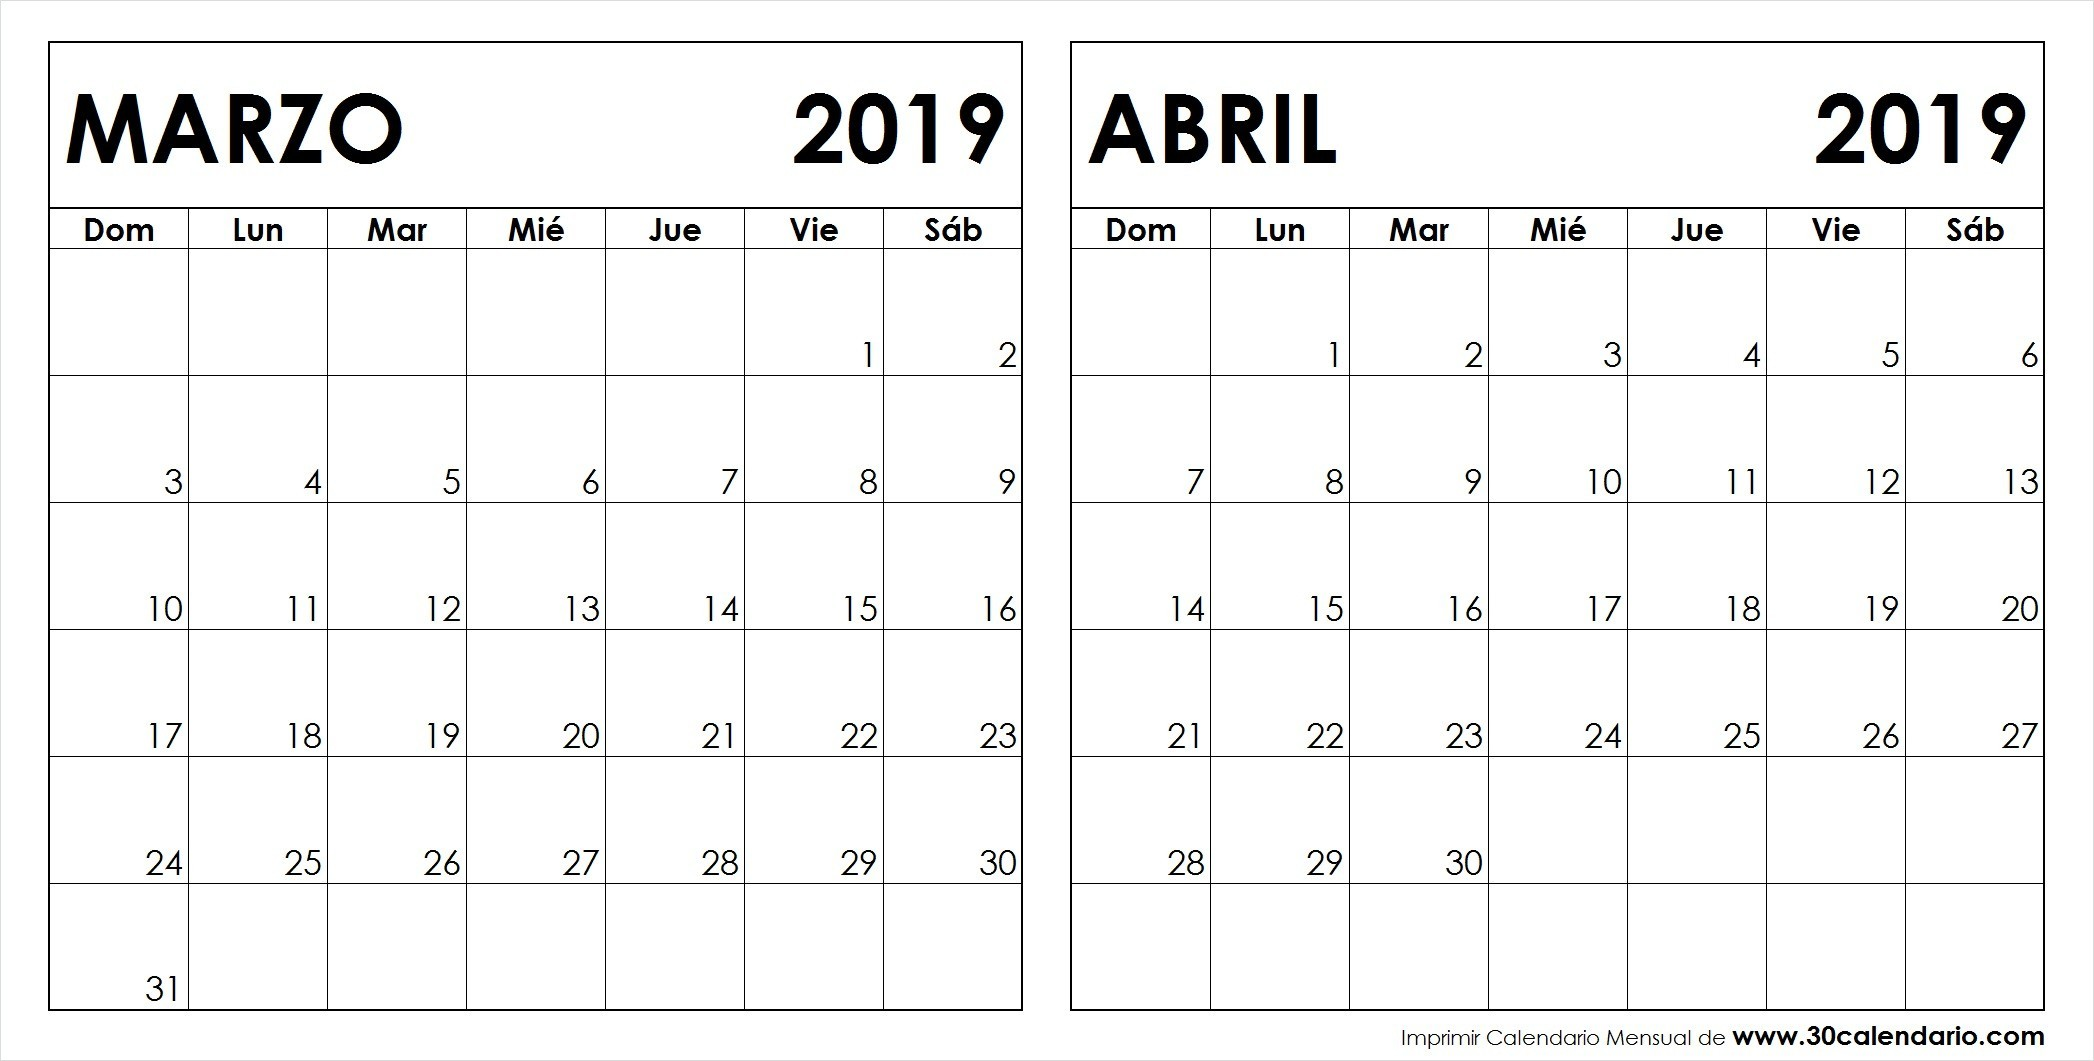 Calendario 2019 Chile Con Feriados Para Imprimir.Calendario Imprimir Abril 2019